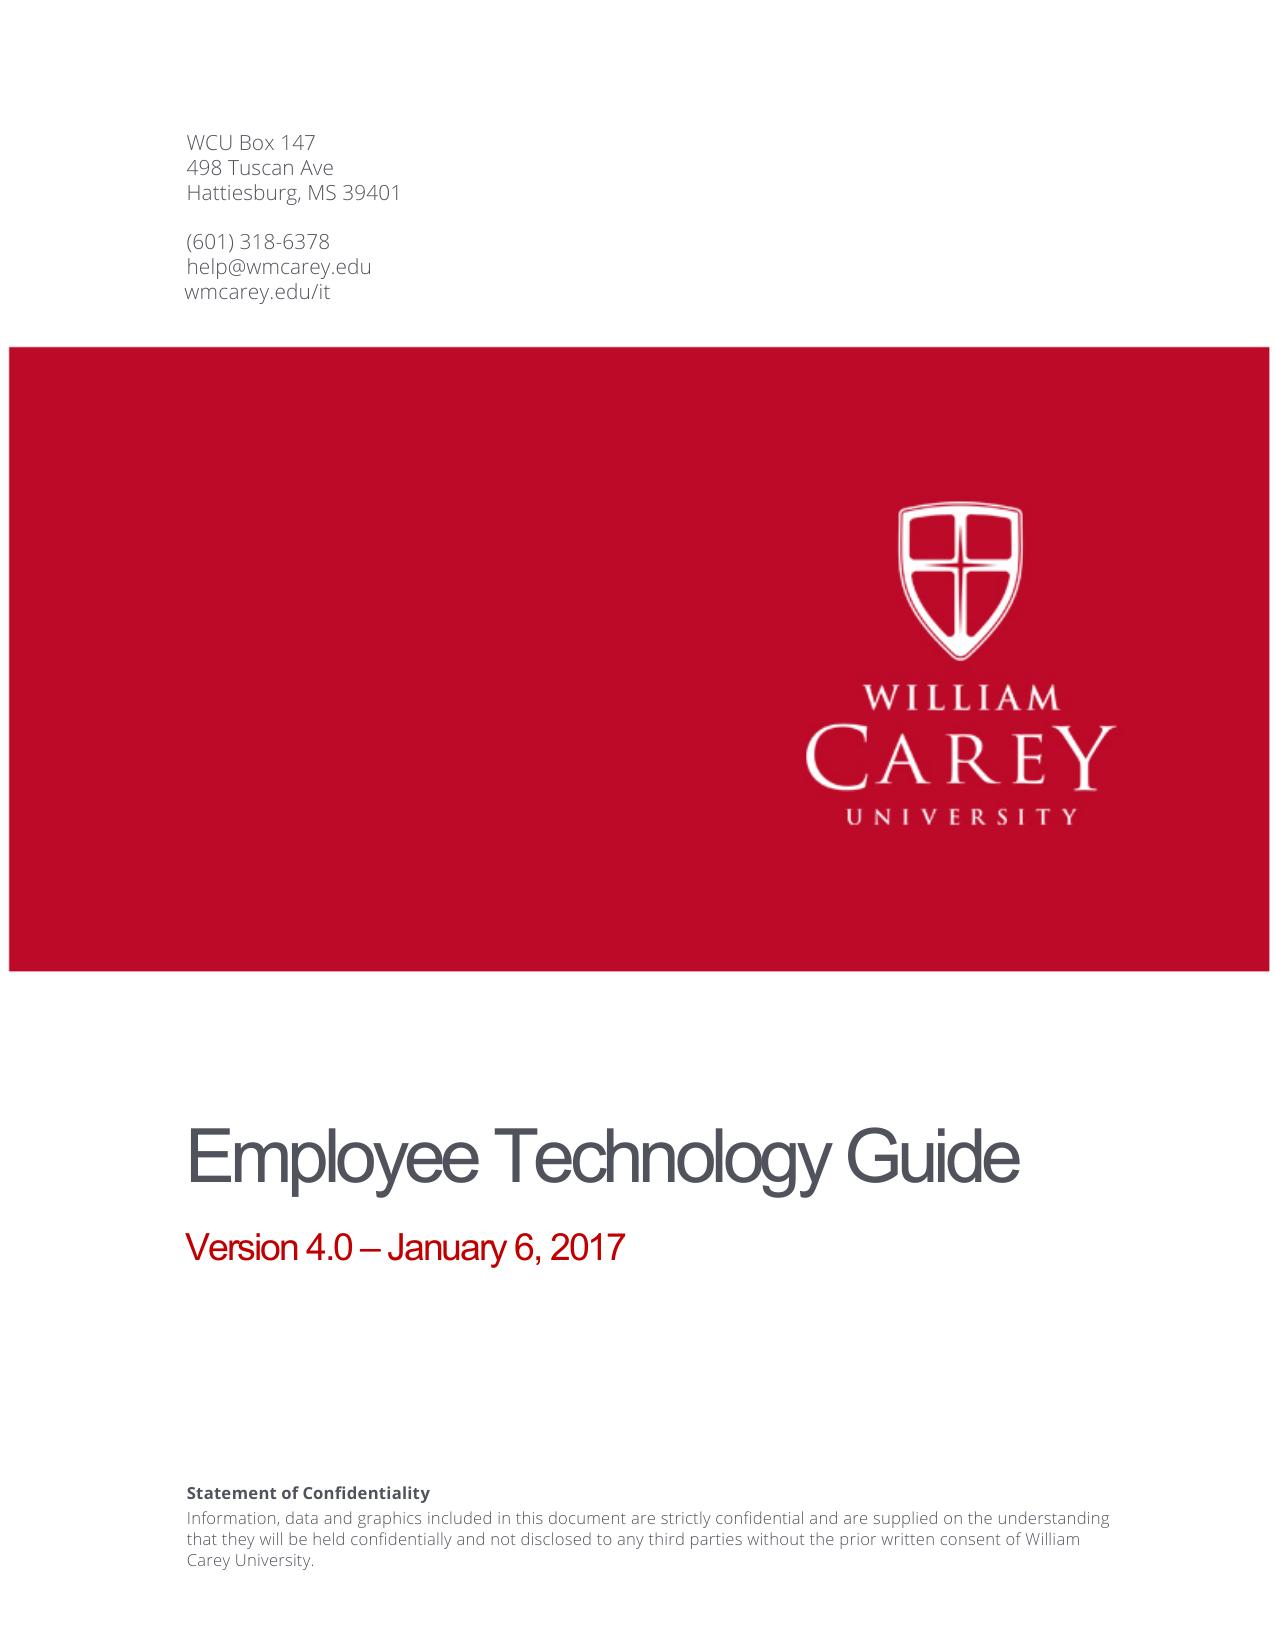 Employee Technology Guide Student Portal Login Manualzz Com